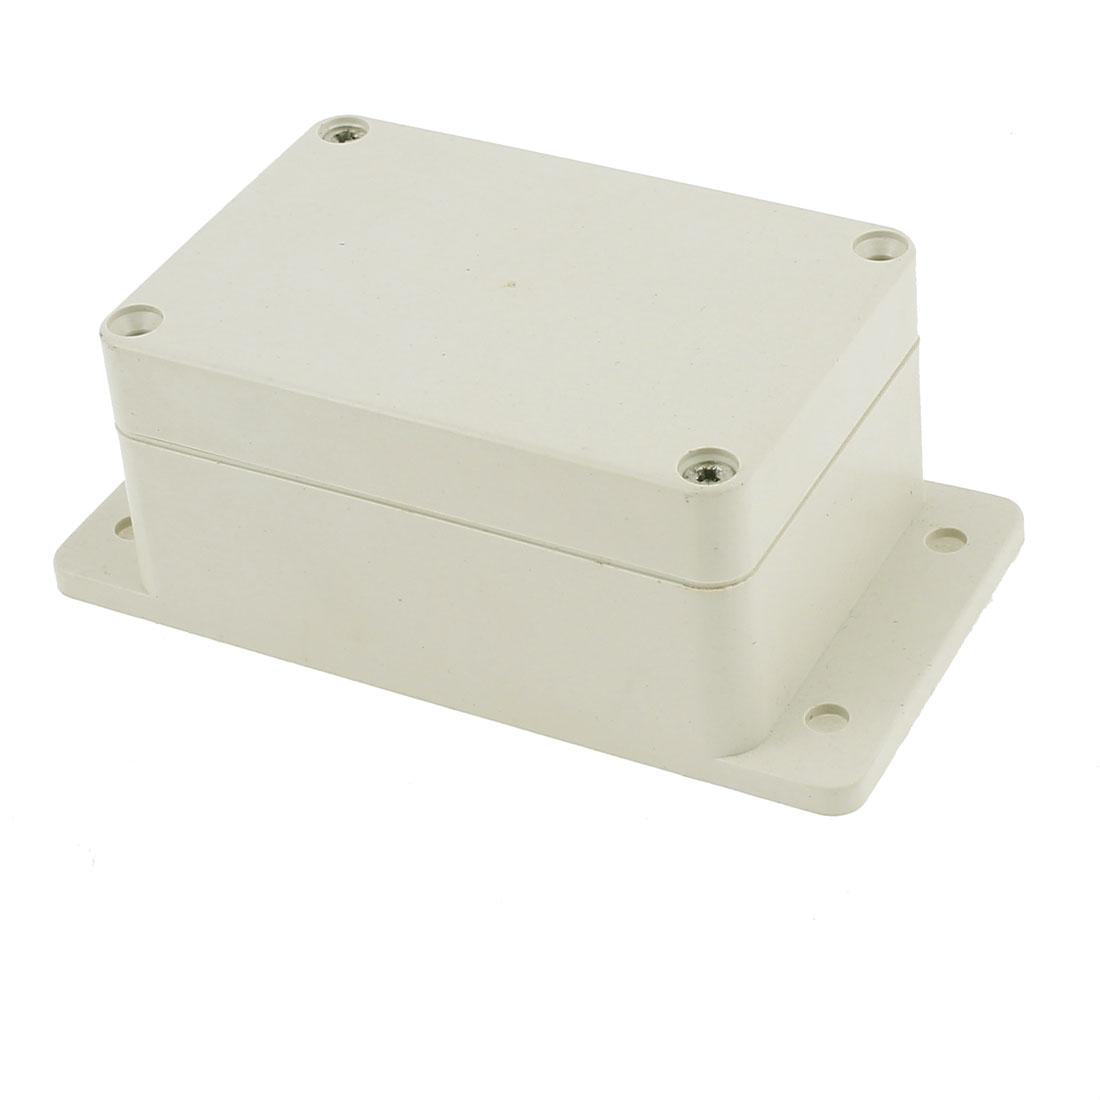 138mm-x-68mm-x-50mm-Waterproof-Junction-Box-DIY-Terminal-Connect-Enclosure